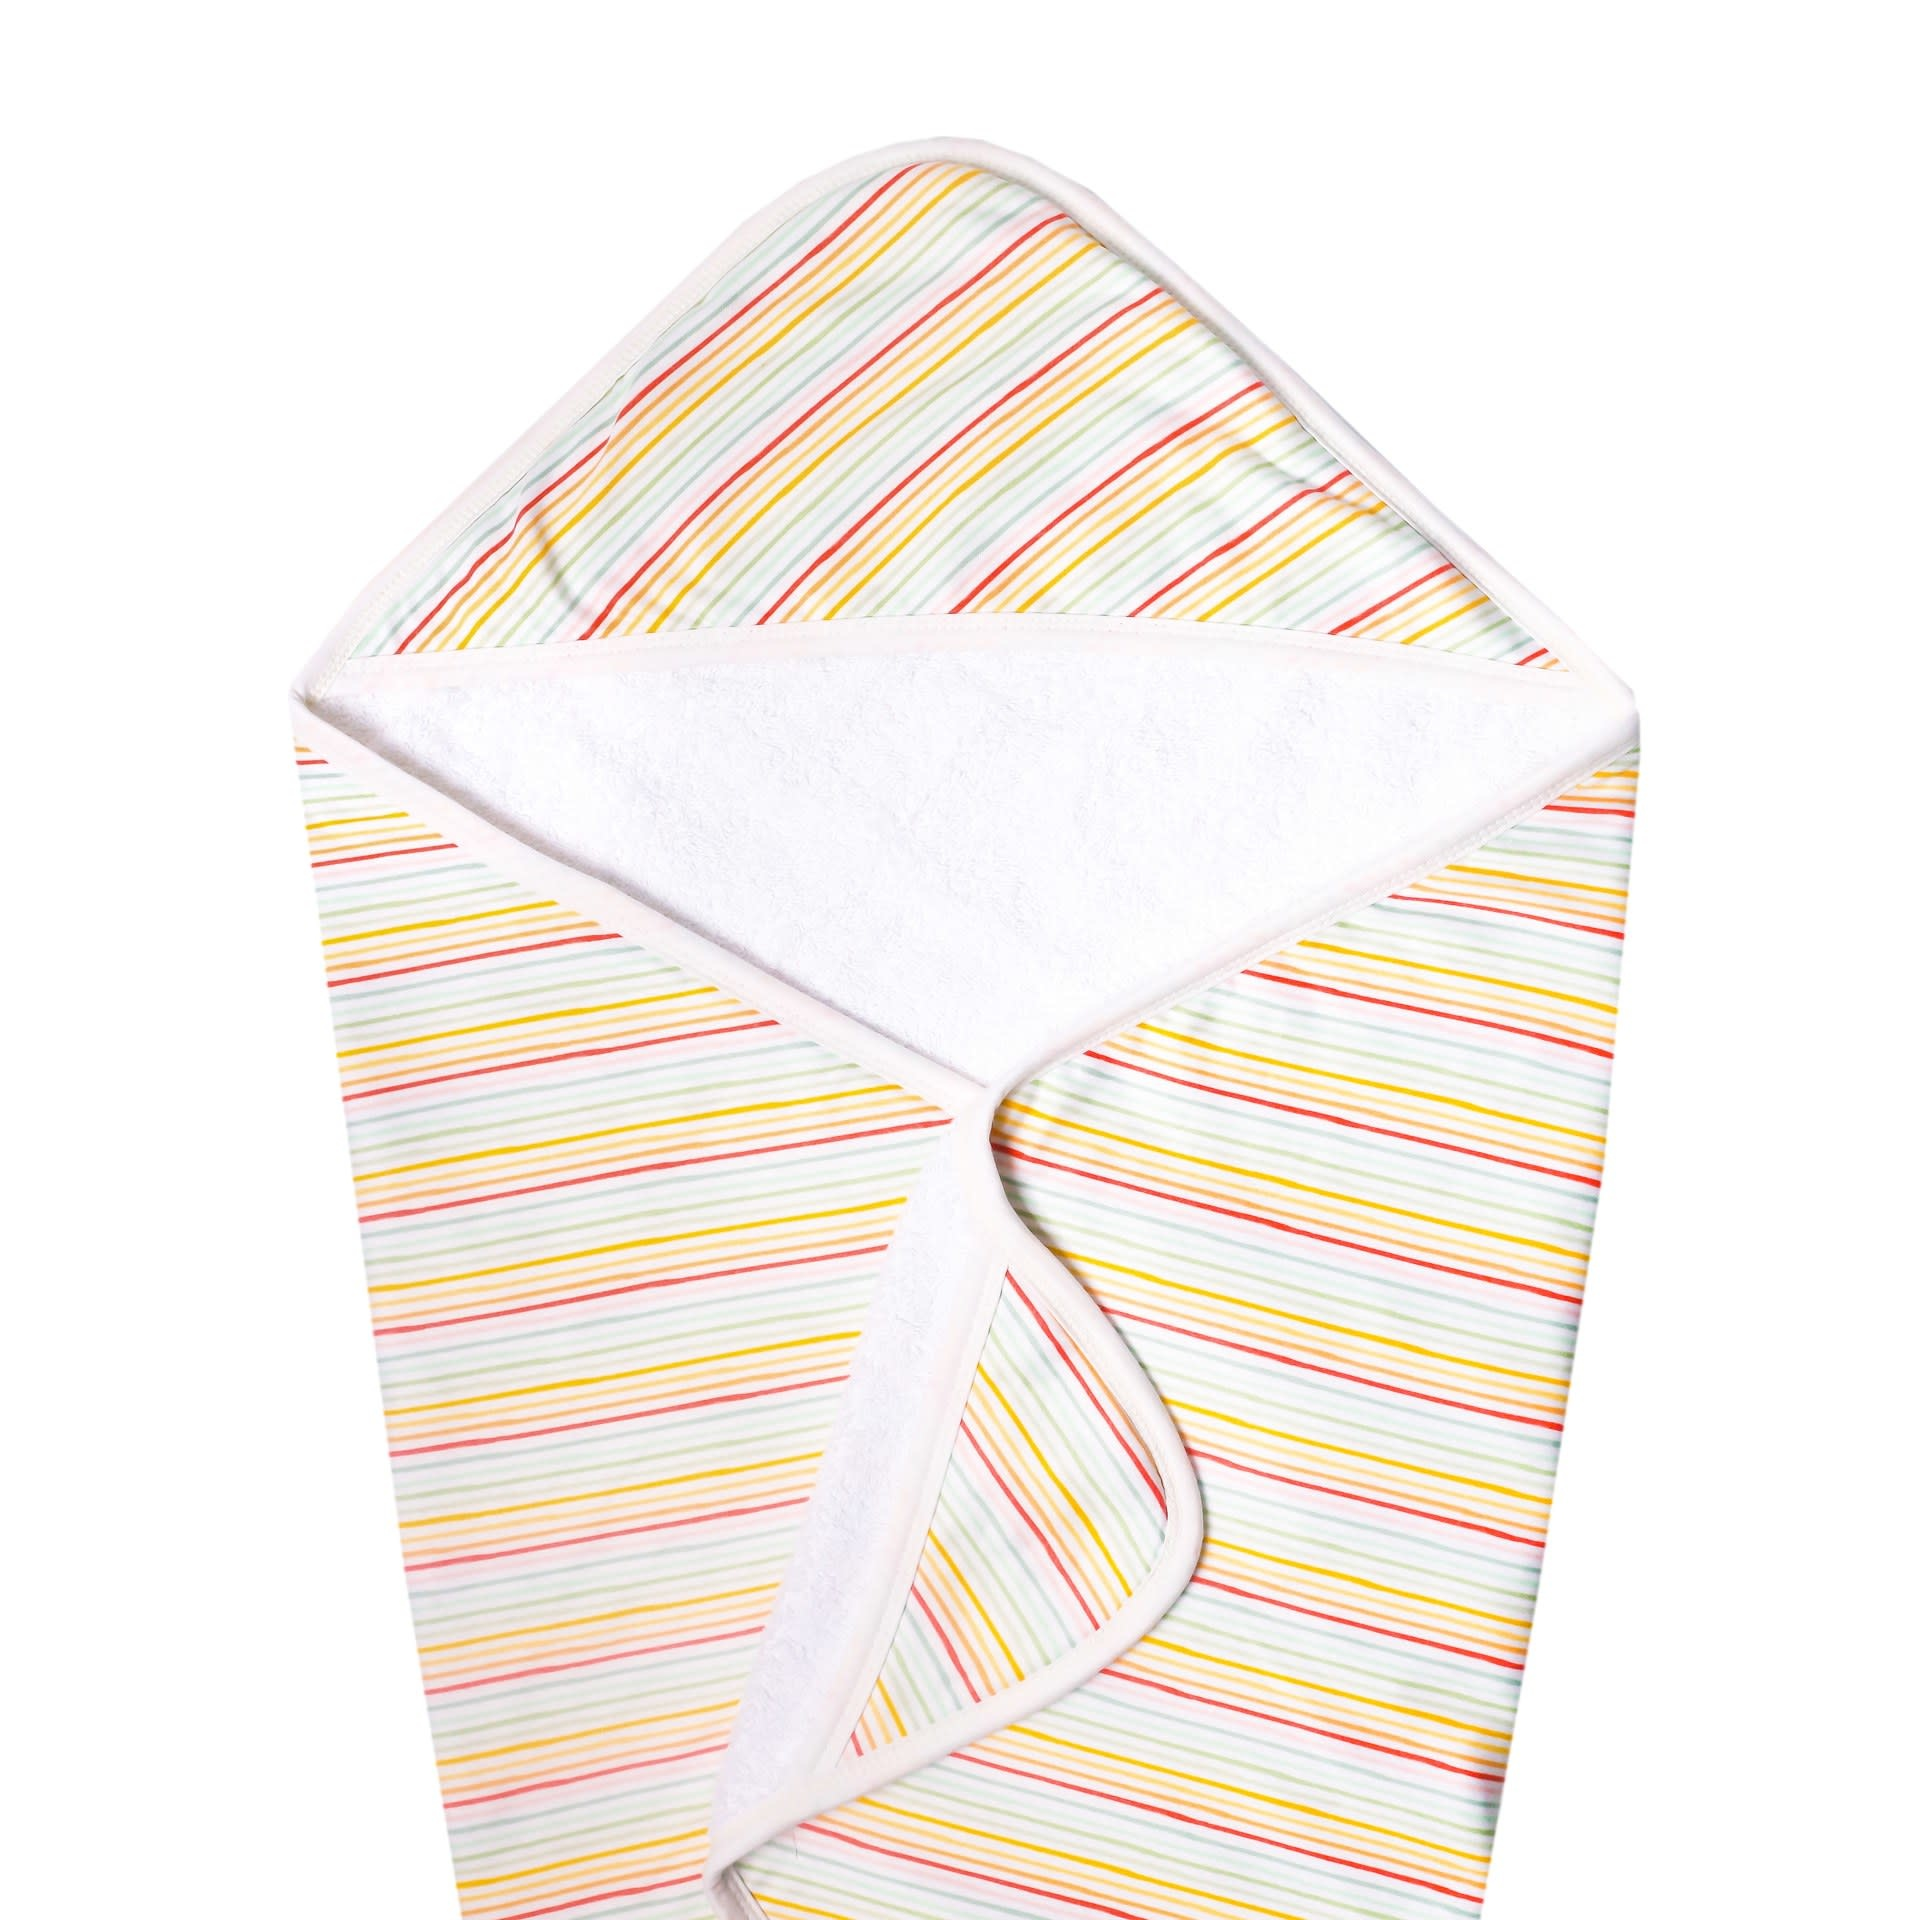 Copper Pearl Knit Hooded Towel - Rainee